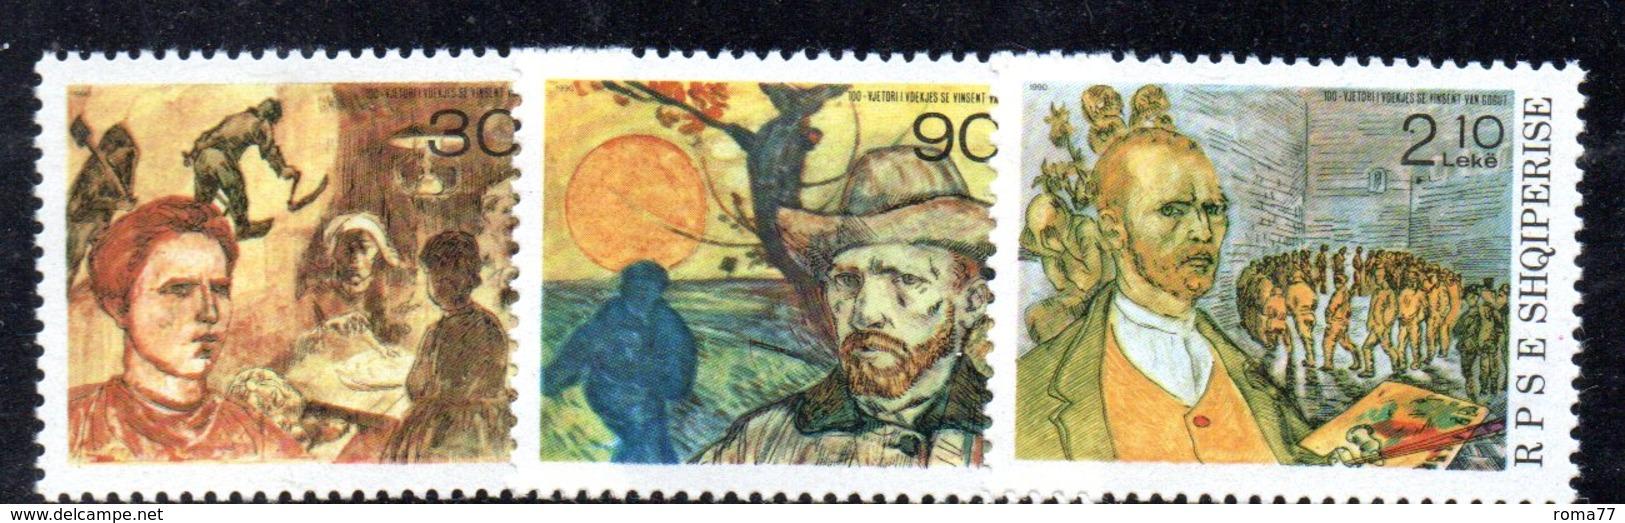 358 490 - ALBANIA 1990, Yvert N. 2233/2235  ***  MNH Van Gogh - Albania